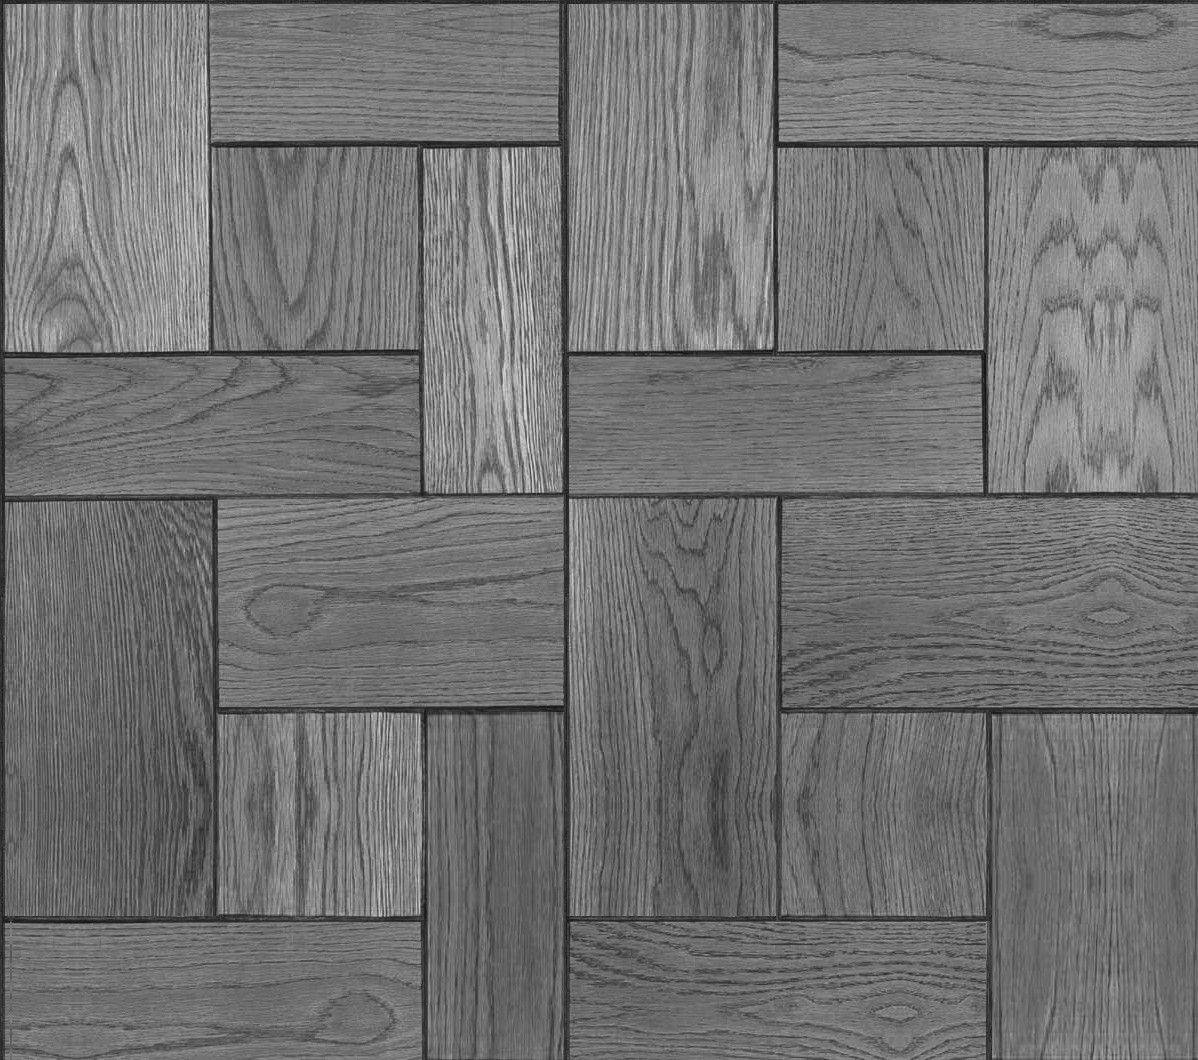 Grey Wood Floor Texture Grey wood flooring texture. Imgkid